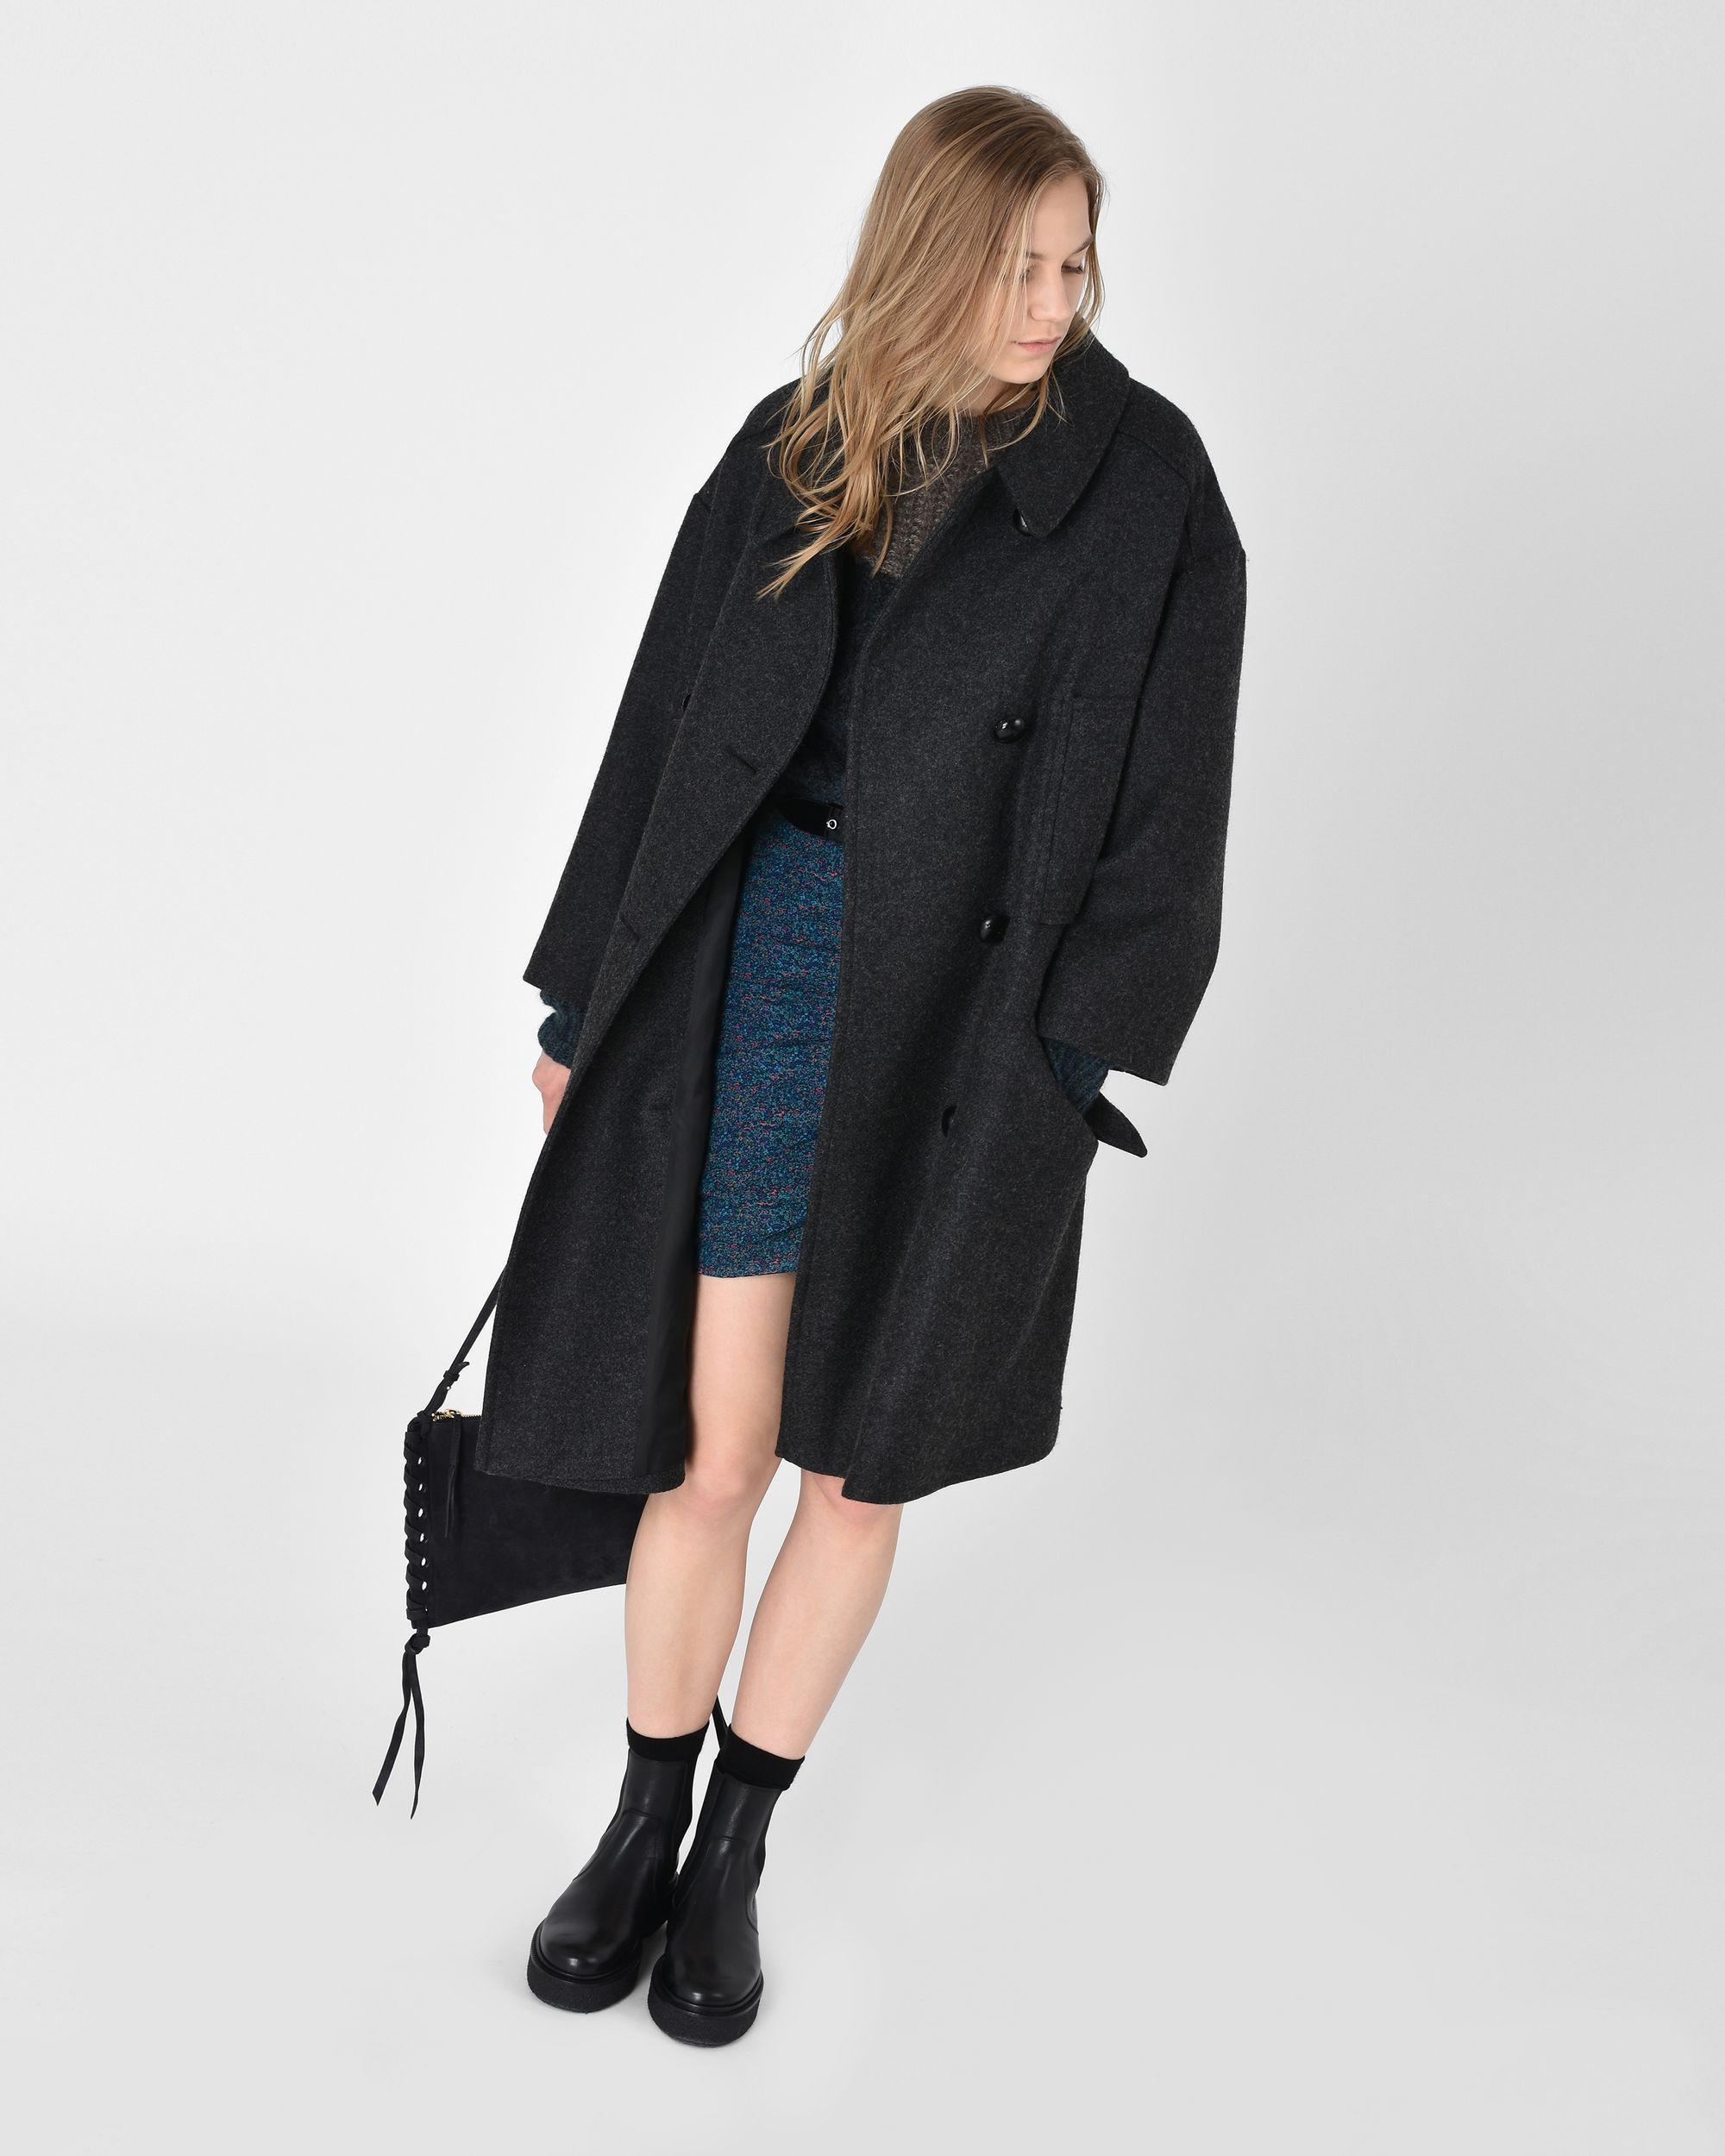 ffef3e21a29a Flicka oversize wool pea coat